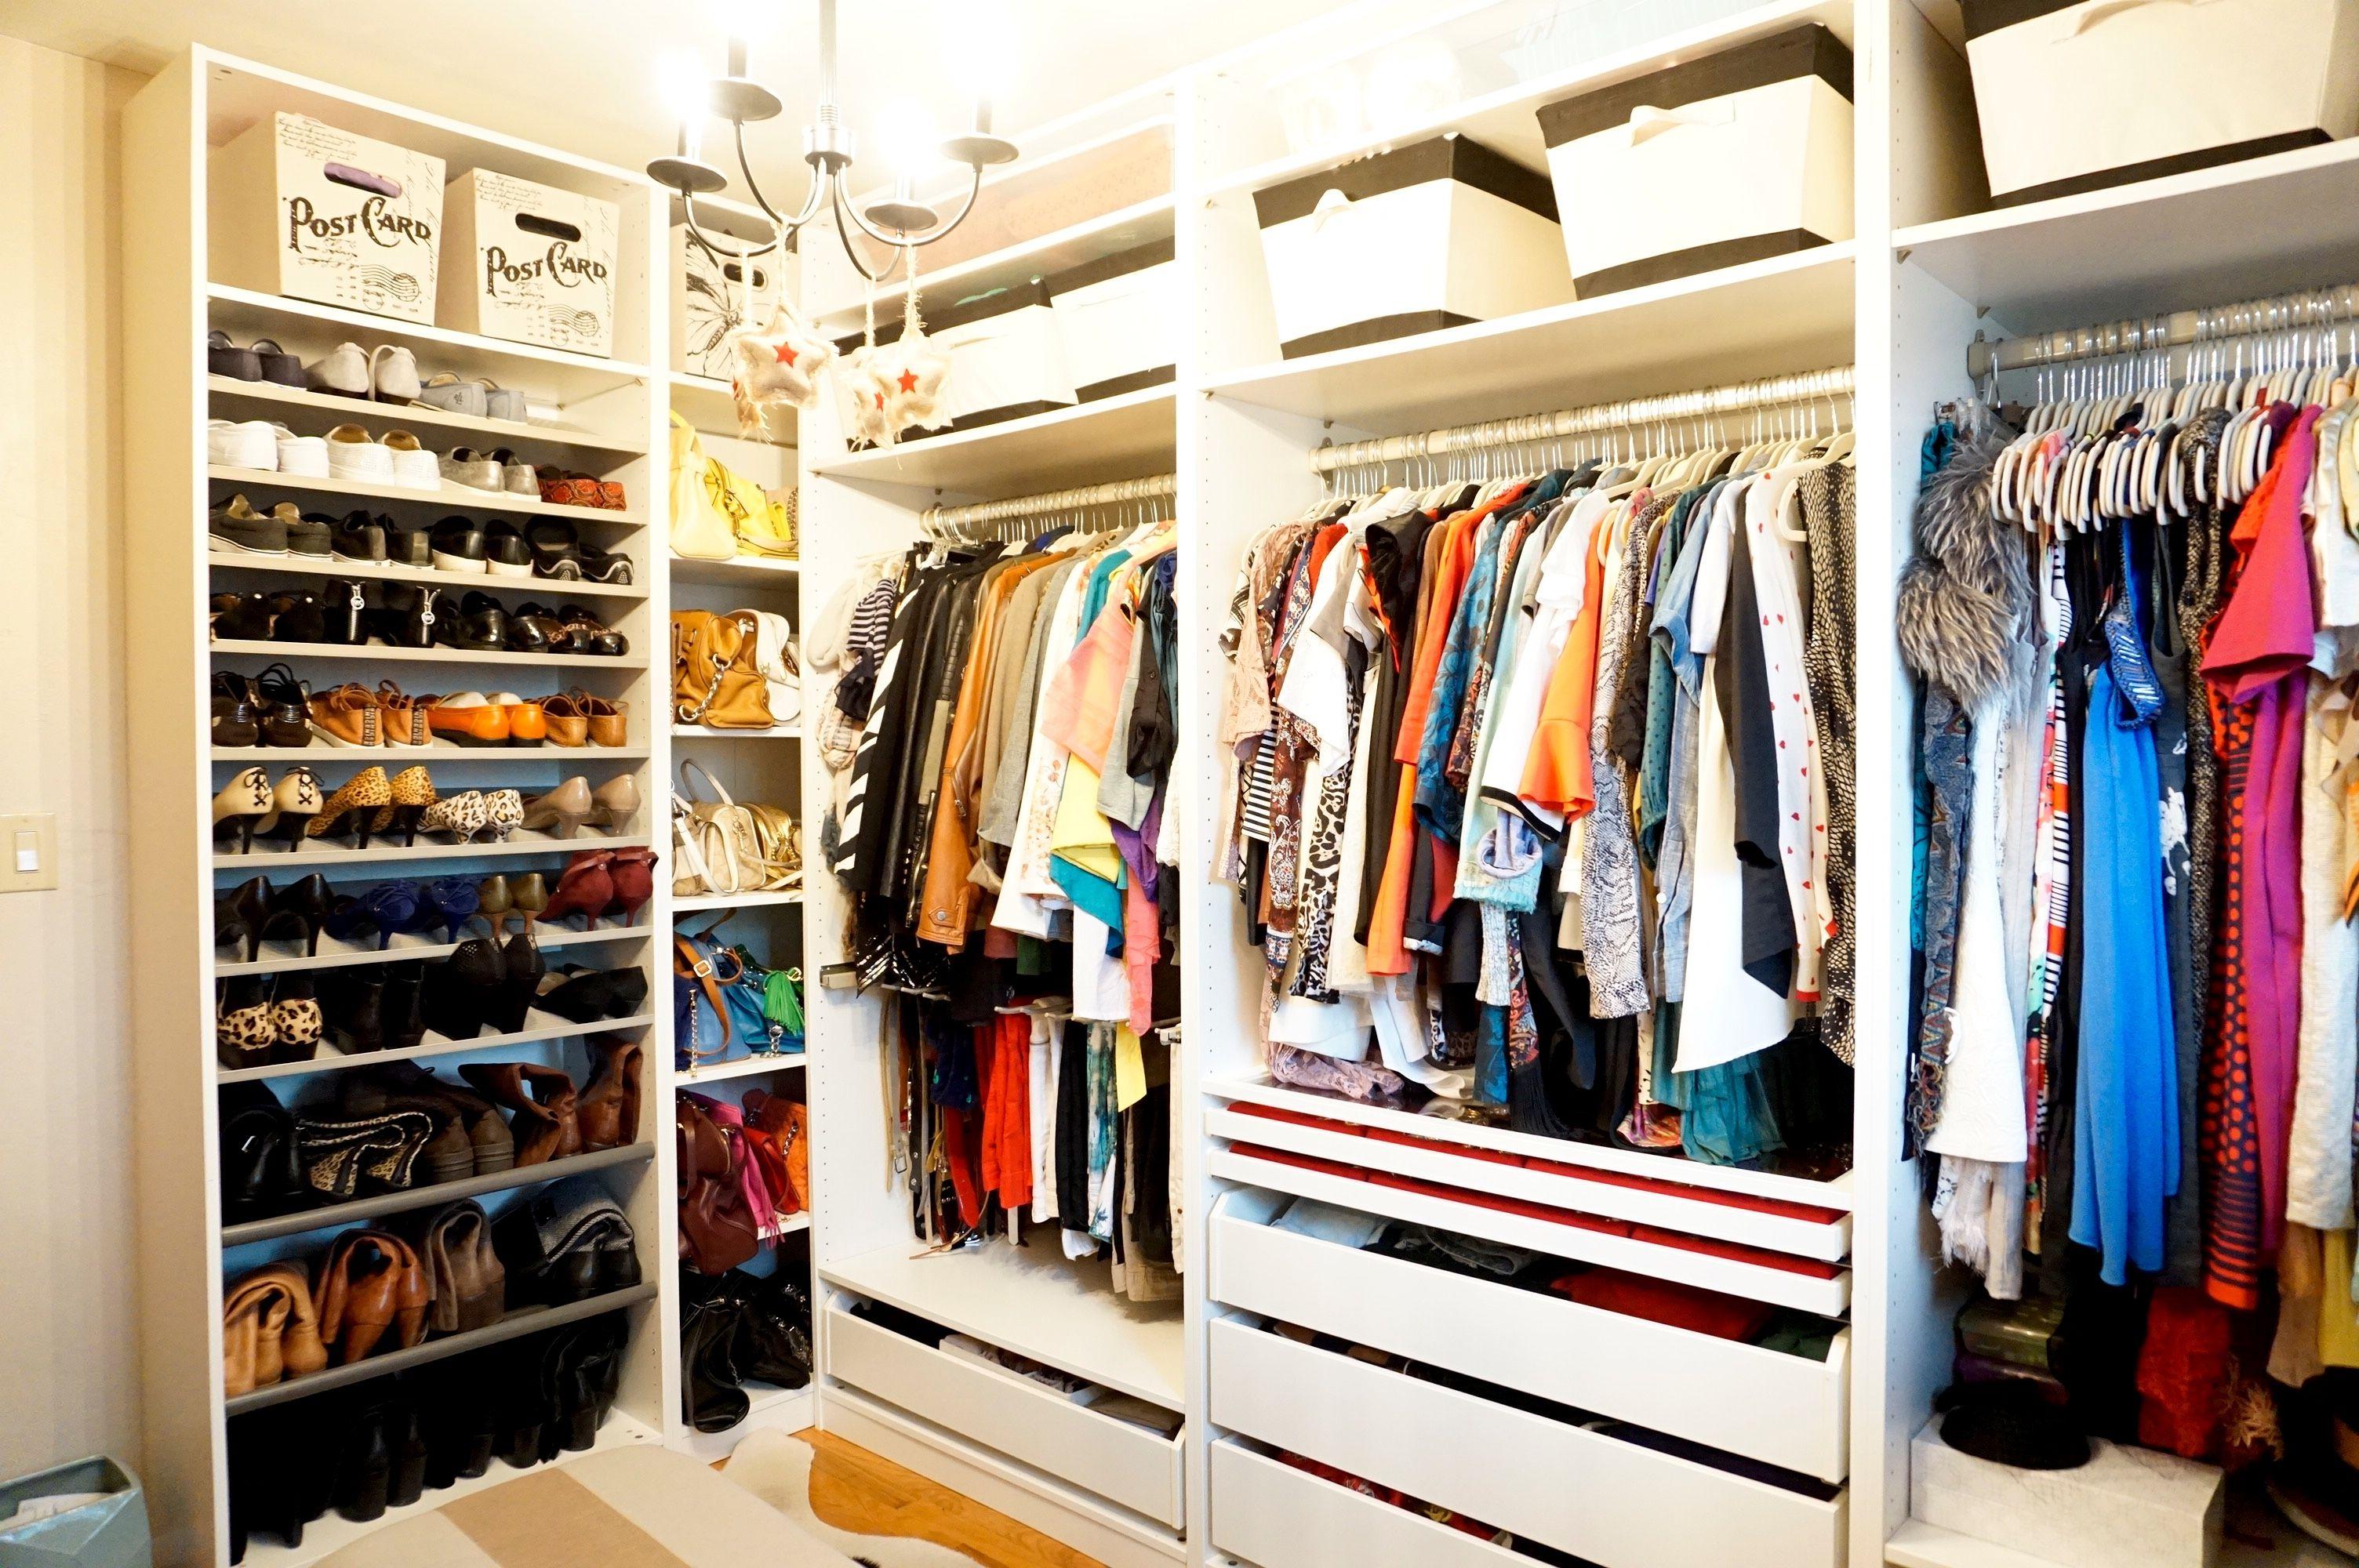 ikea pax closet system review organizing clothes accessories pinterest ikea pax closet. Black Bedroom Furniture Sets. Home Design Ideas